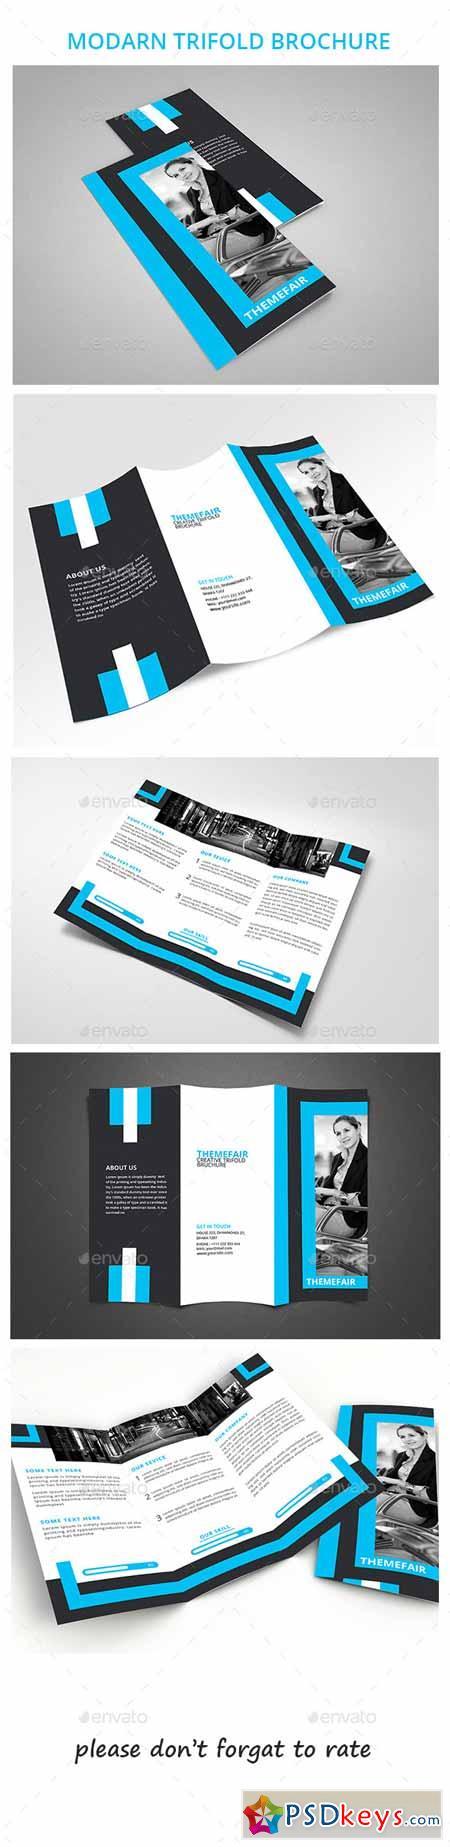 Modern Trifold Brochure 10156324